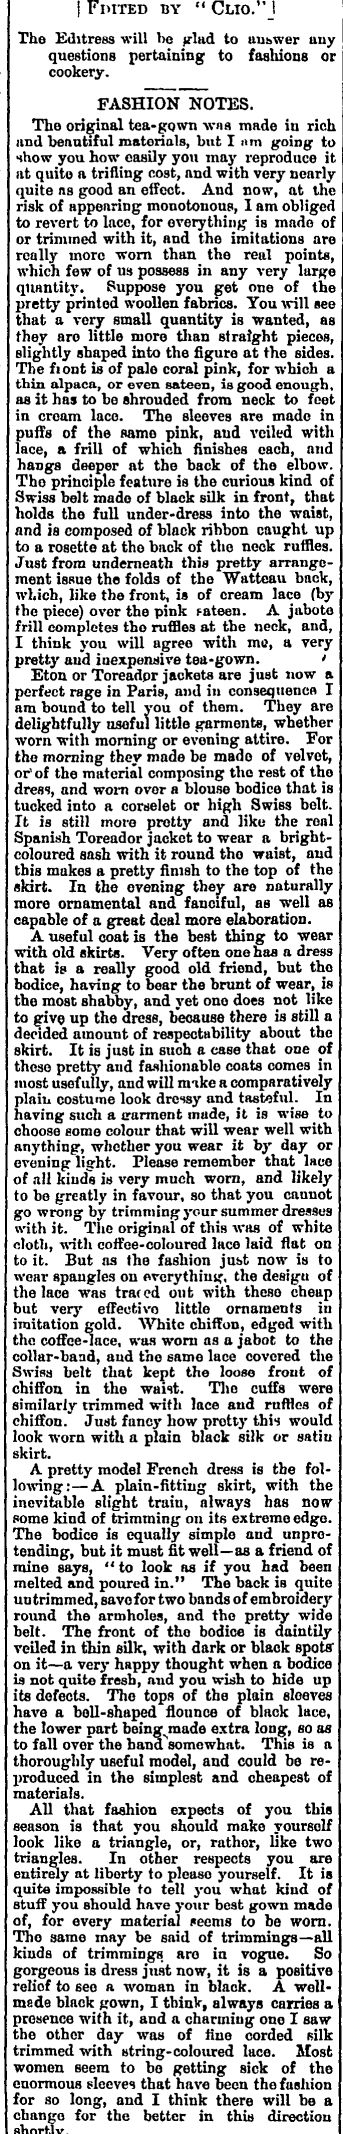 best swiss waists swiss belts vs underbust corsets images on tea gowns and swiss belts 1893